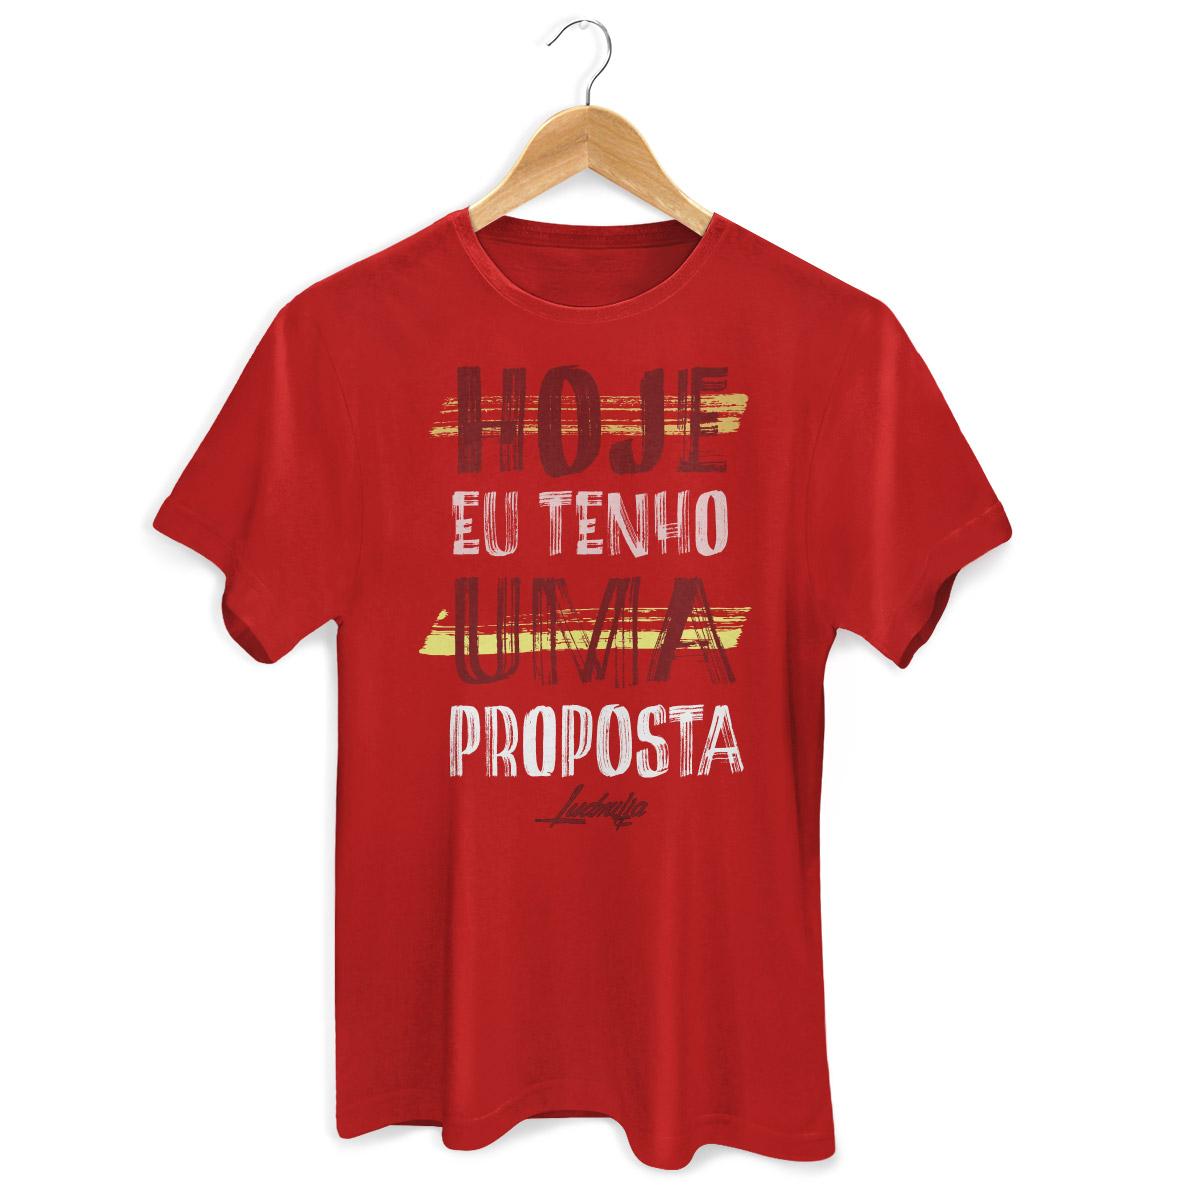 Camiseta Masculina Ludmilla Hoje Eu Tenho Uma Proposta